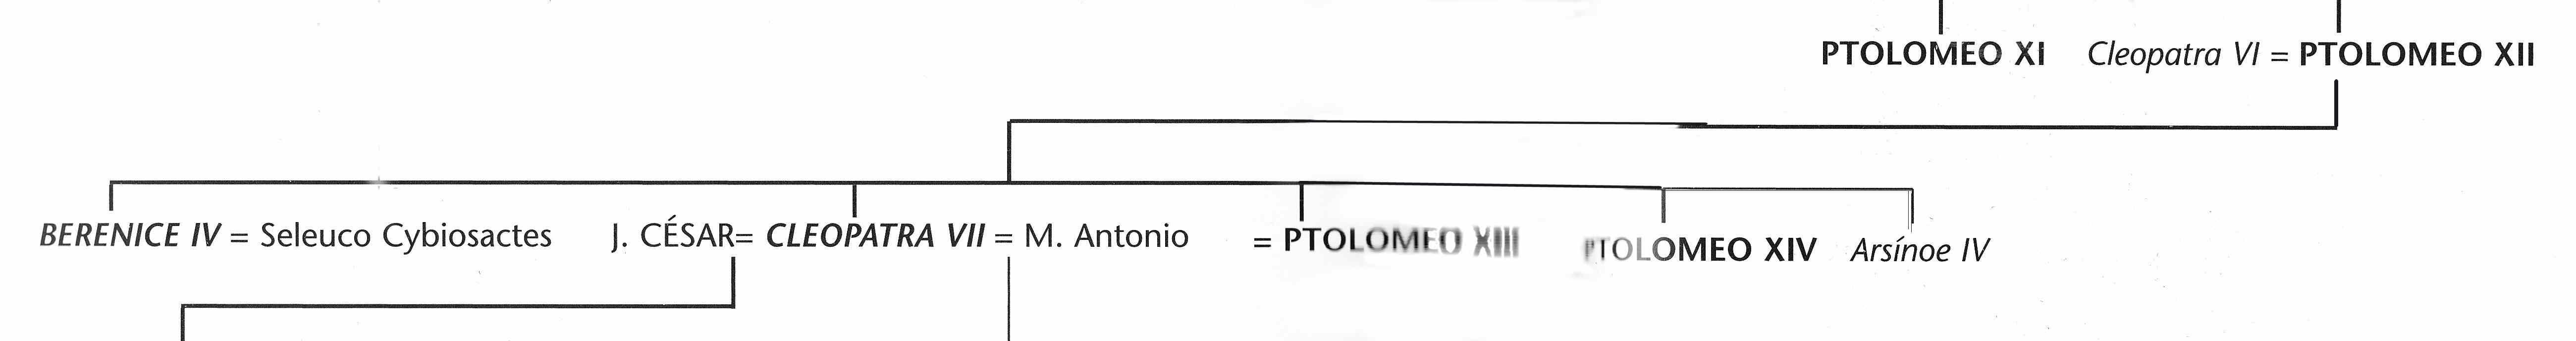 Egipto Antiguo 65 y Ptolomeo XII 8